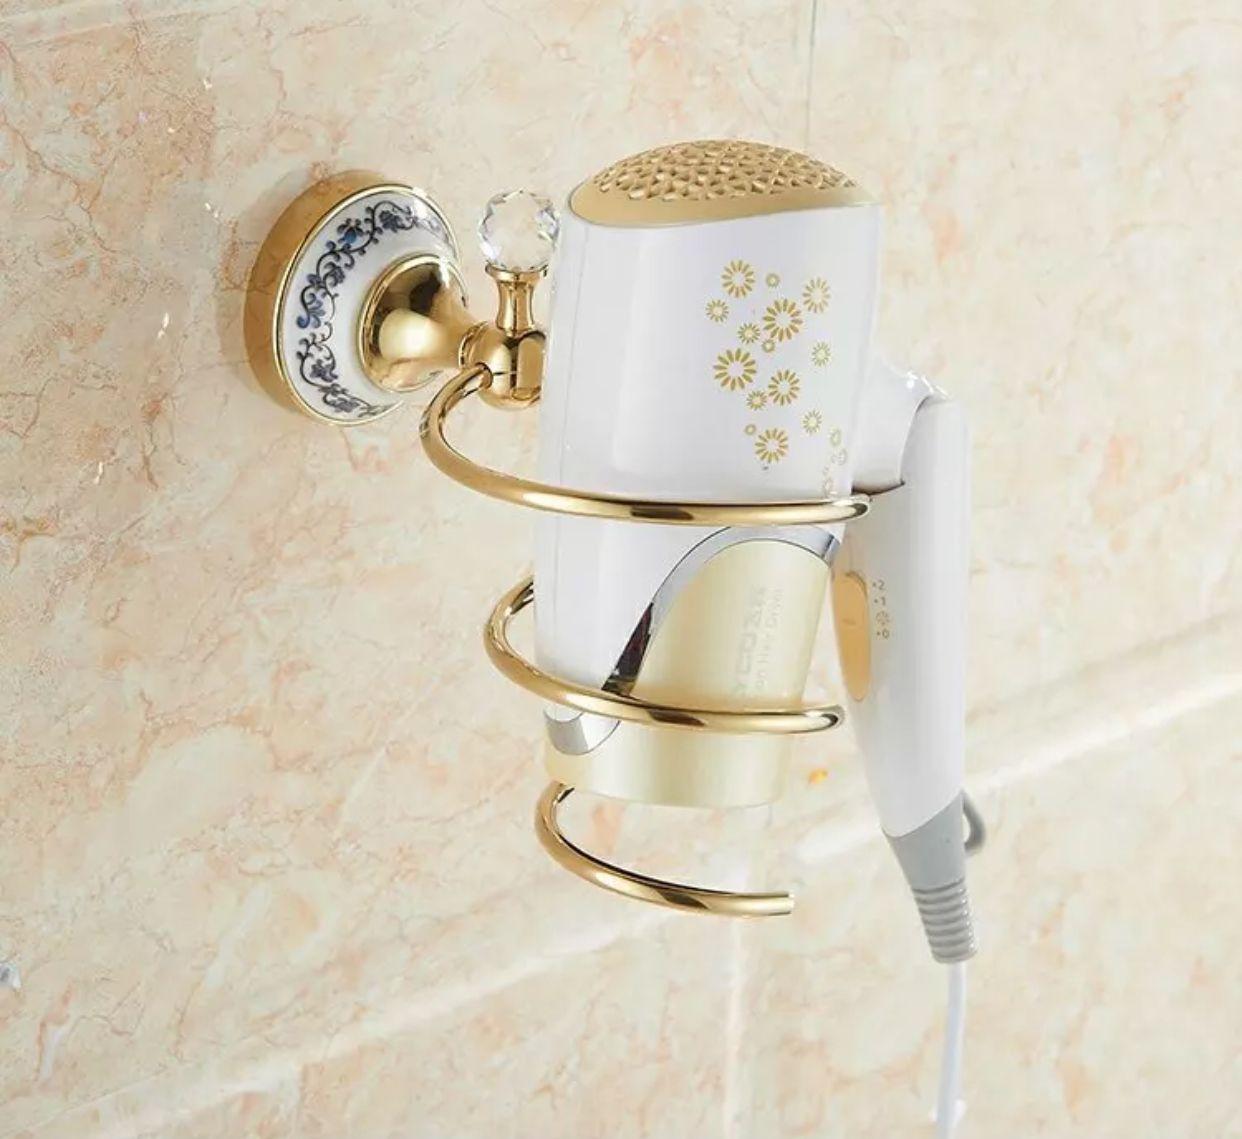 Bathroom Shelves Hair Dryer Holder Rack Golden Metal Material Hair Drier Storage Spring Hair Blower Shelf Wall Mounted